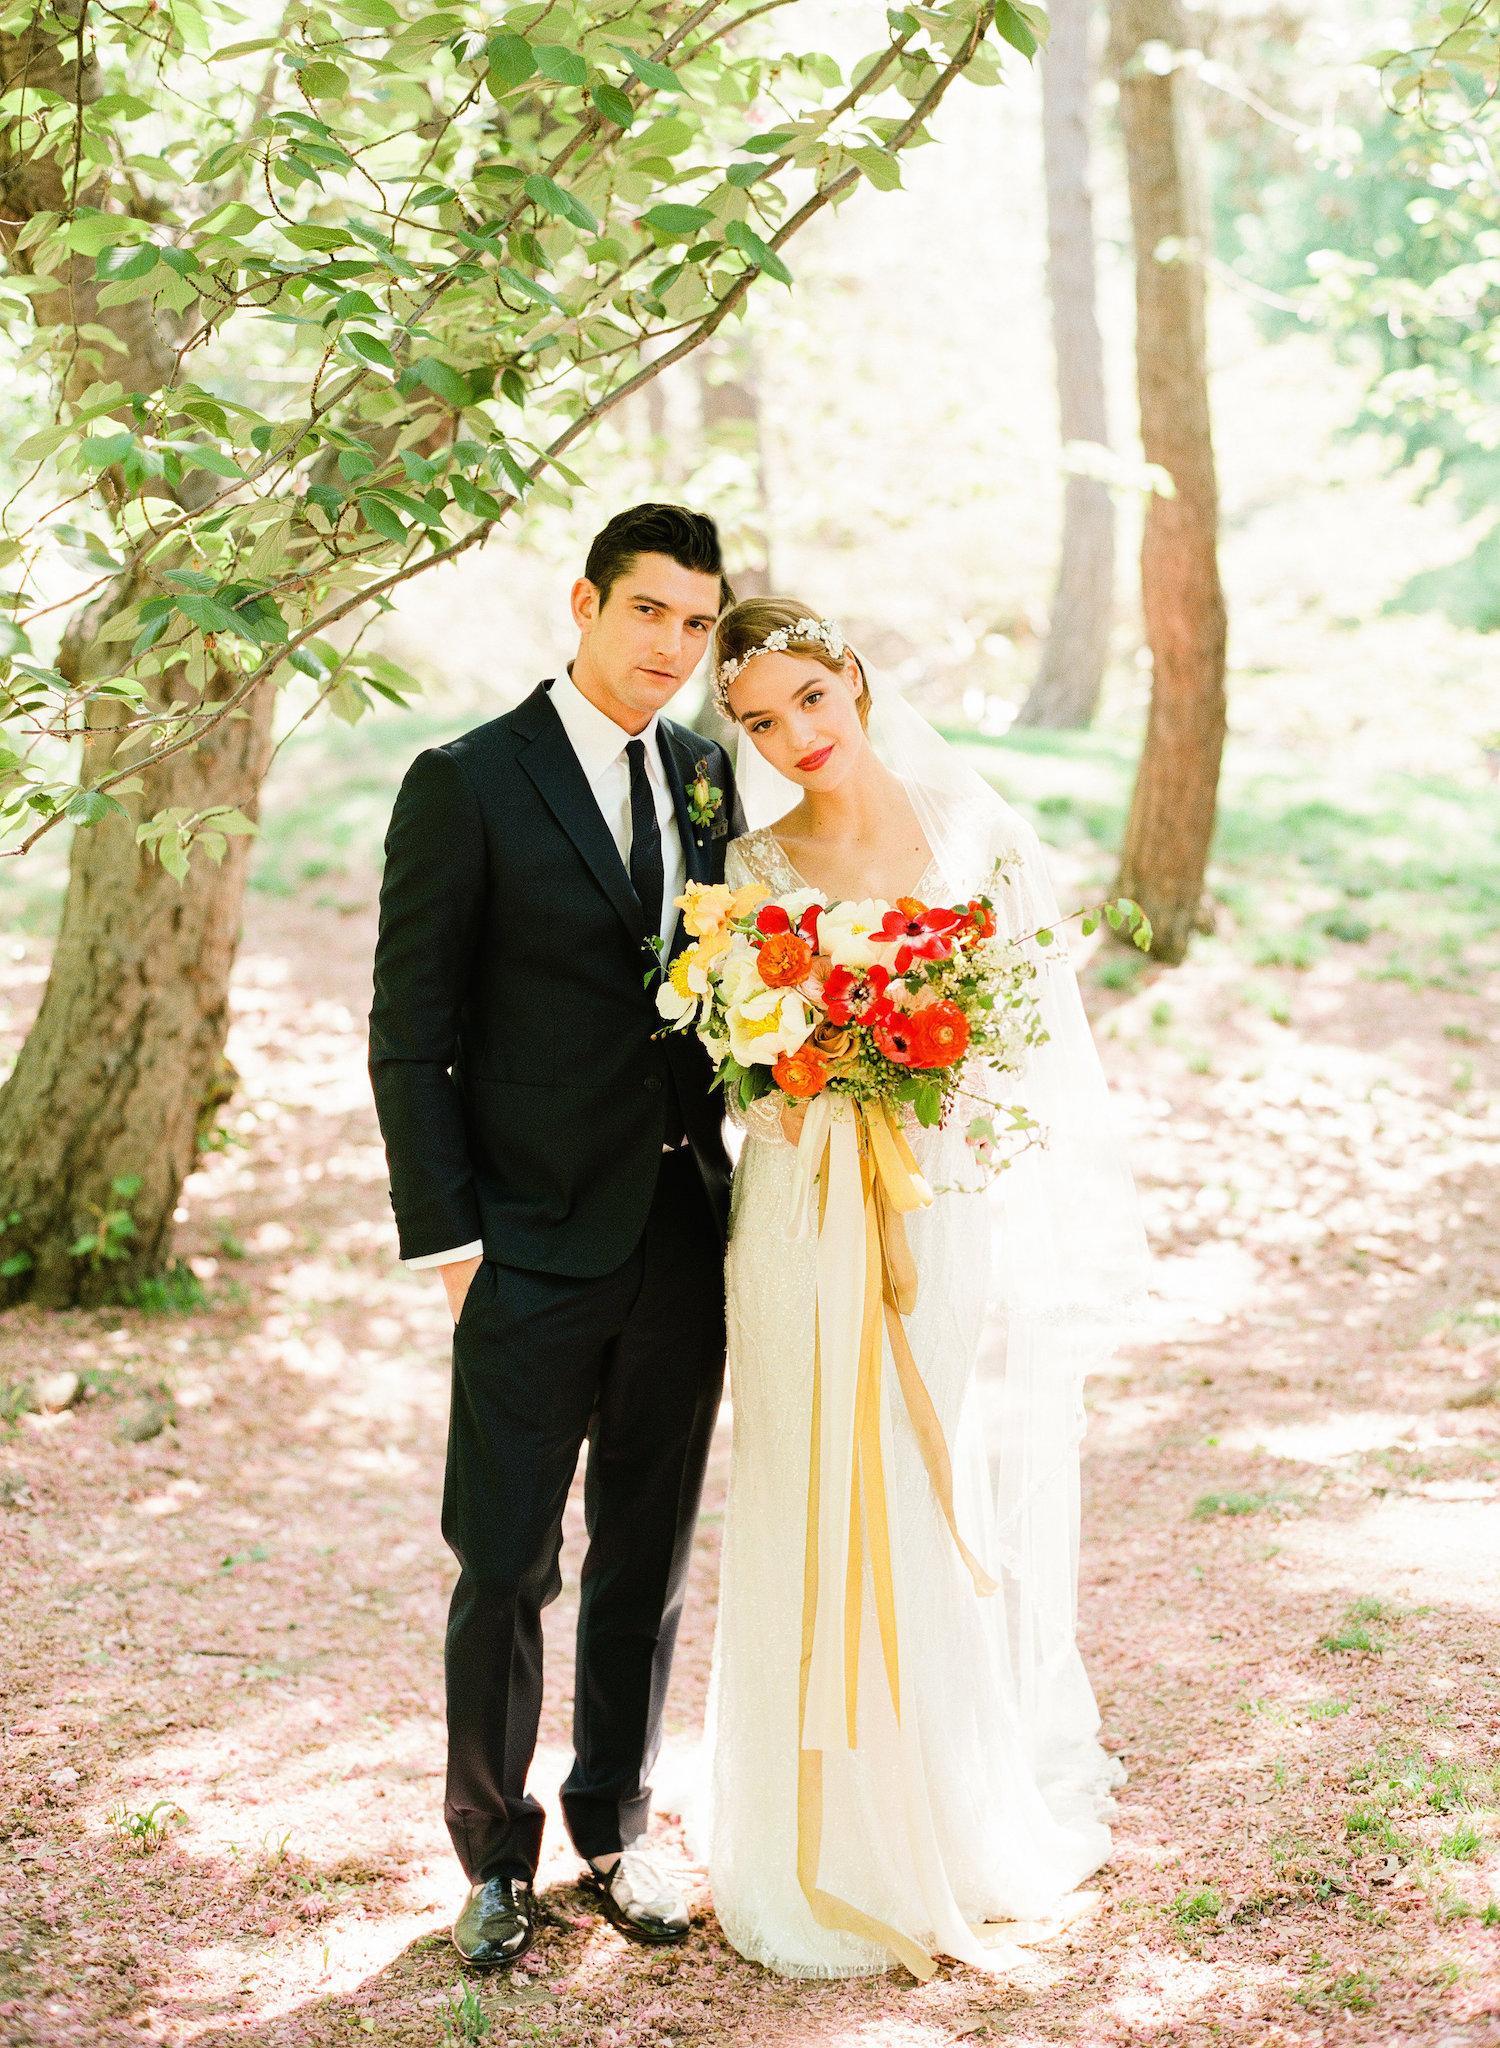 Morning Glow - Full Aperture Floral & Lindsay Madden Photography 20.jpeg